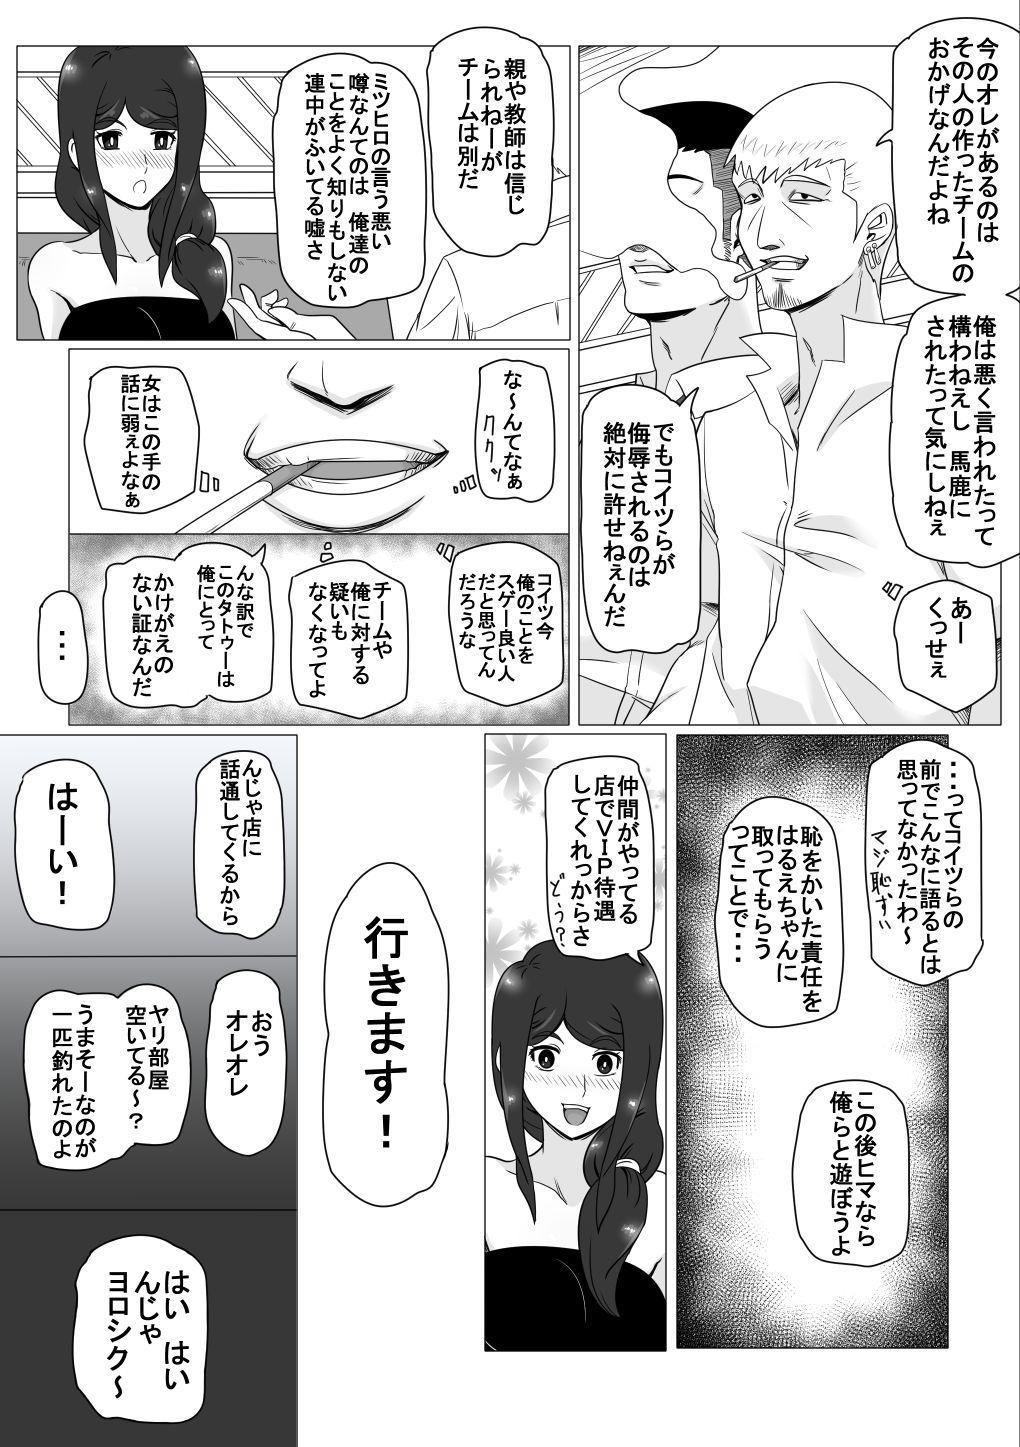 Osananajimi no Natsuyasumi 13